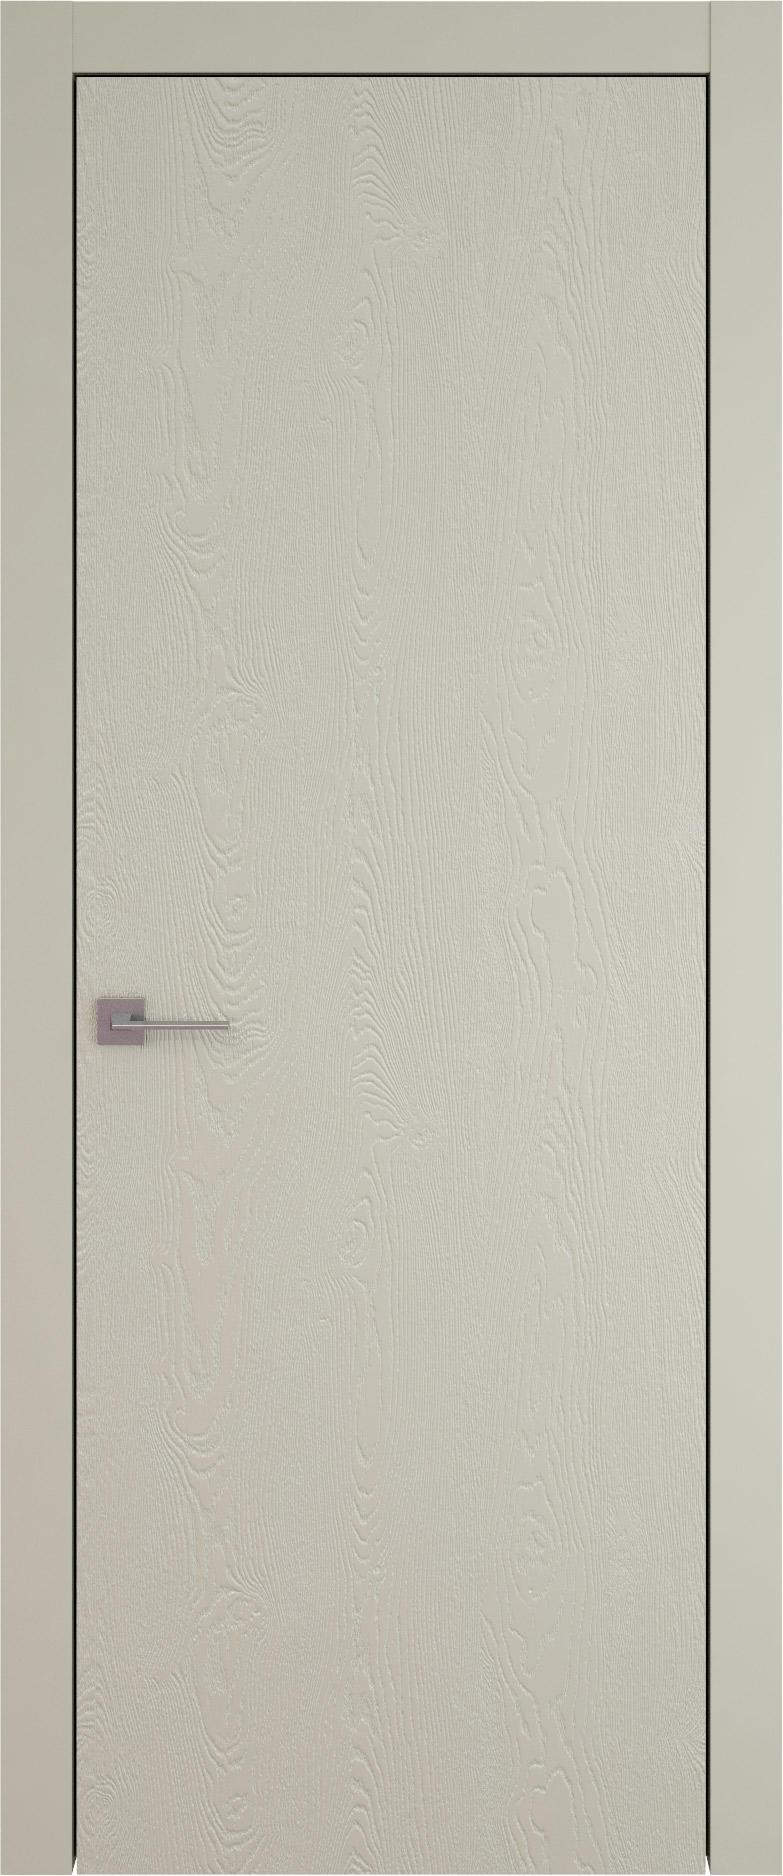 Tivoli А-1 цвет - Серо-оливковая эмаль по шпону (RAL 7032) Без стекла (ДГ)